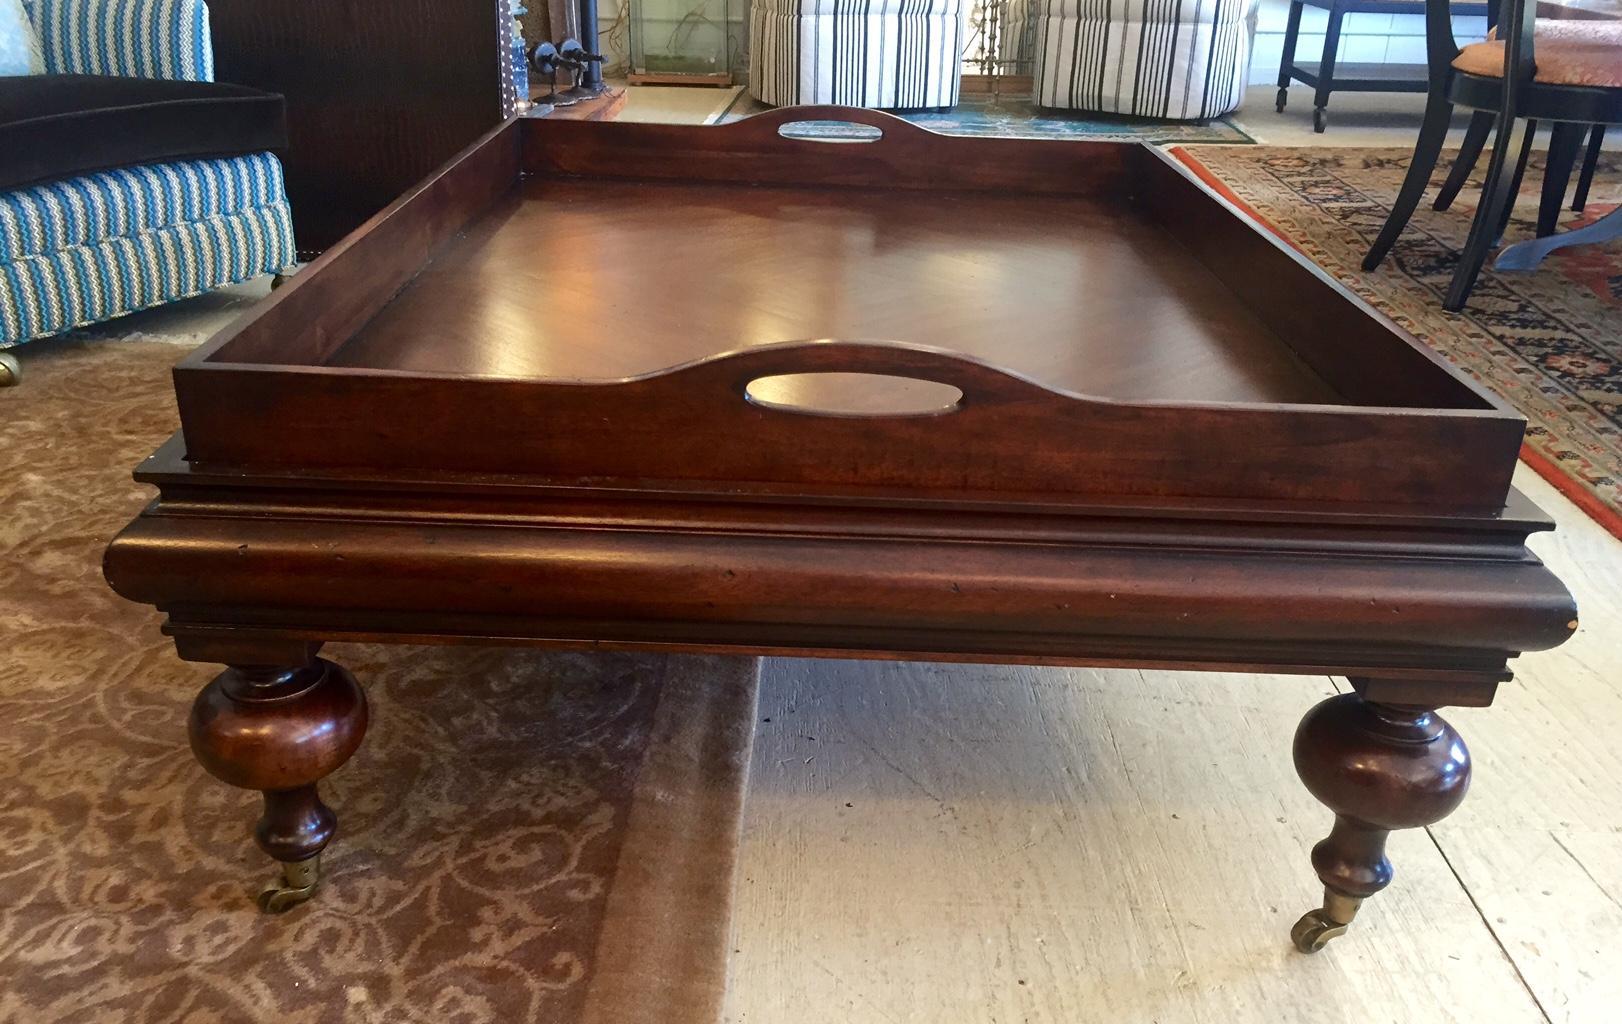 Large Butleru0027s Tray Mahogany Coffee Table   Image 2 ...